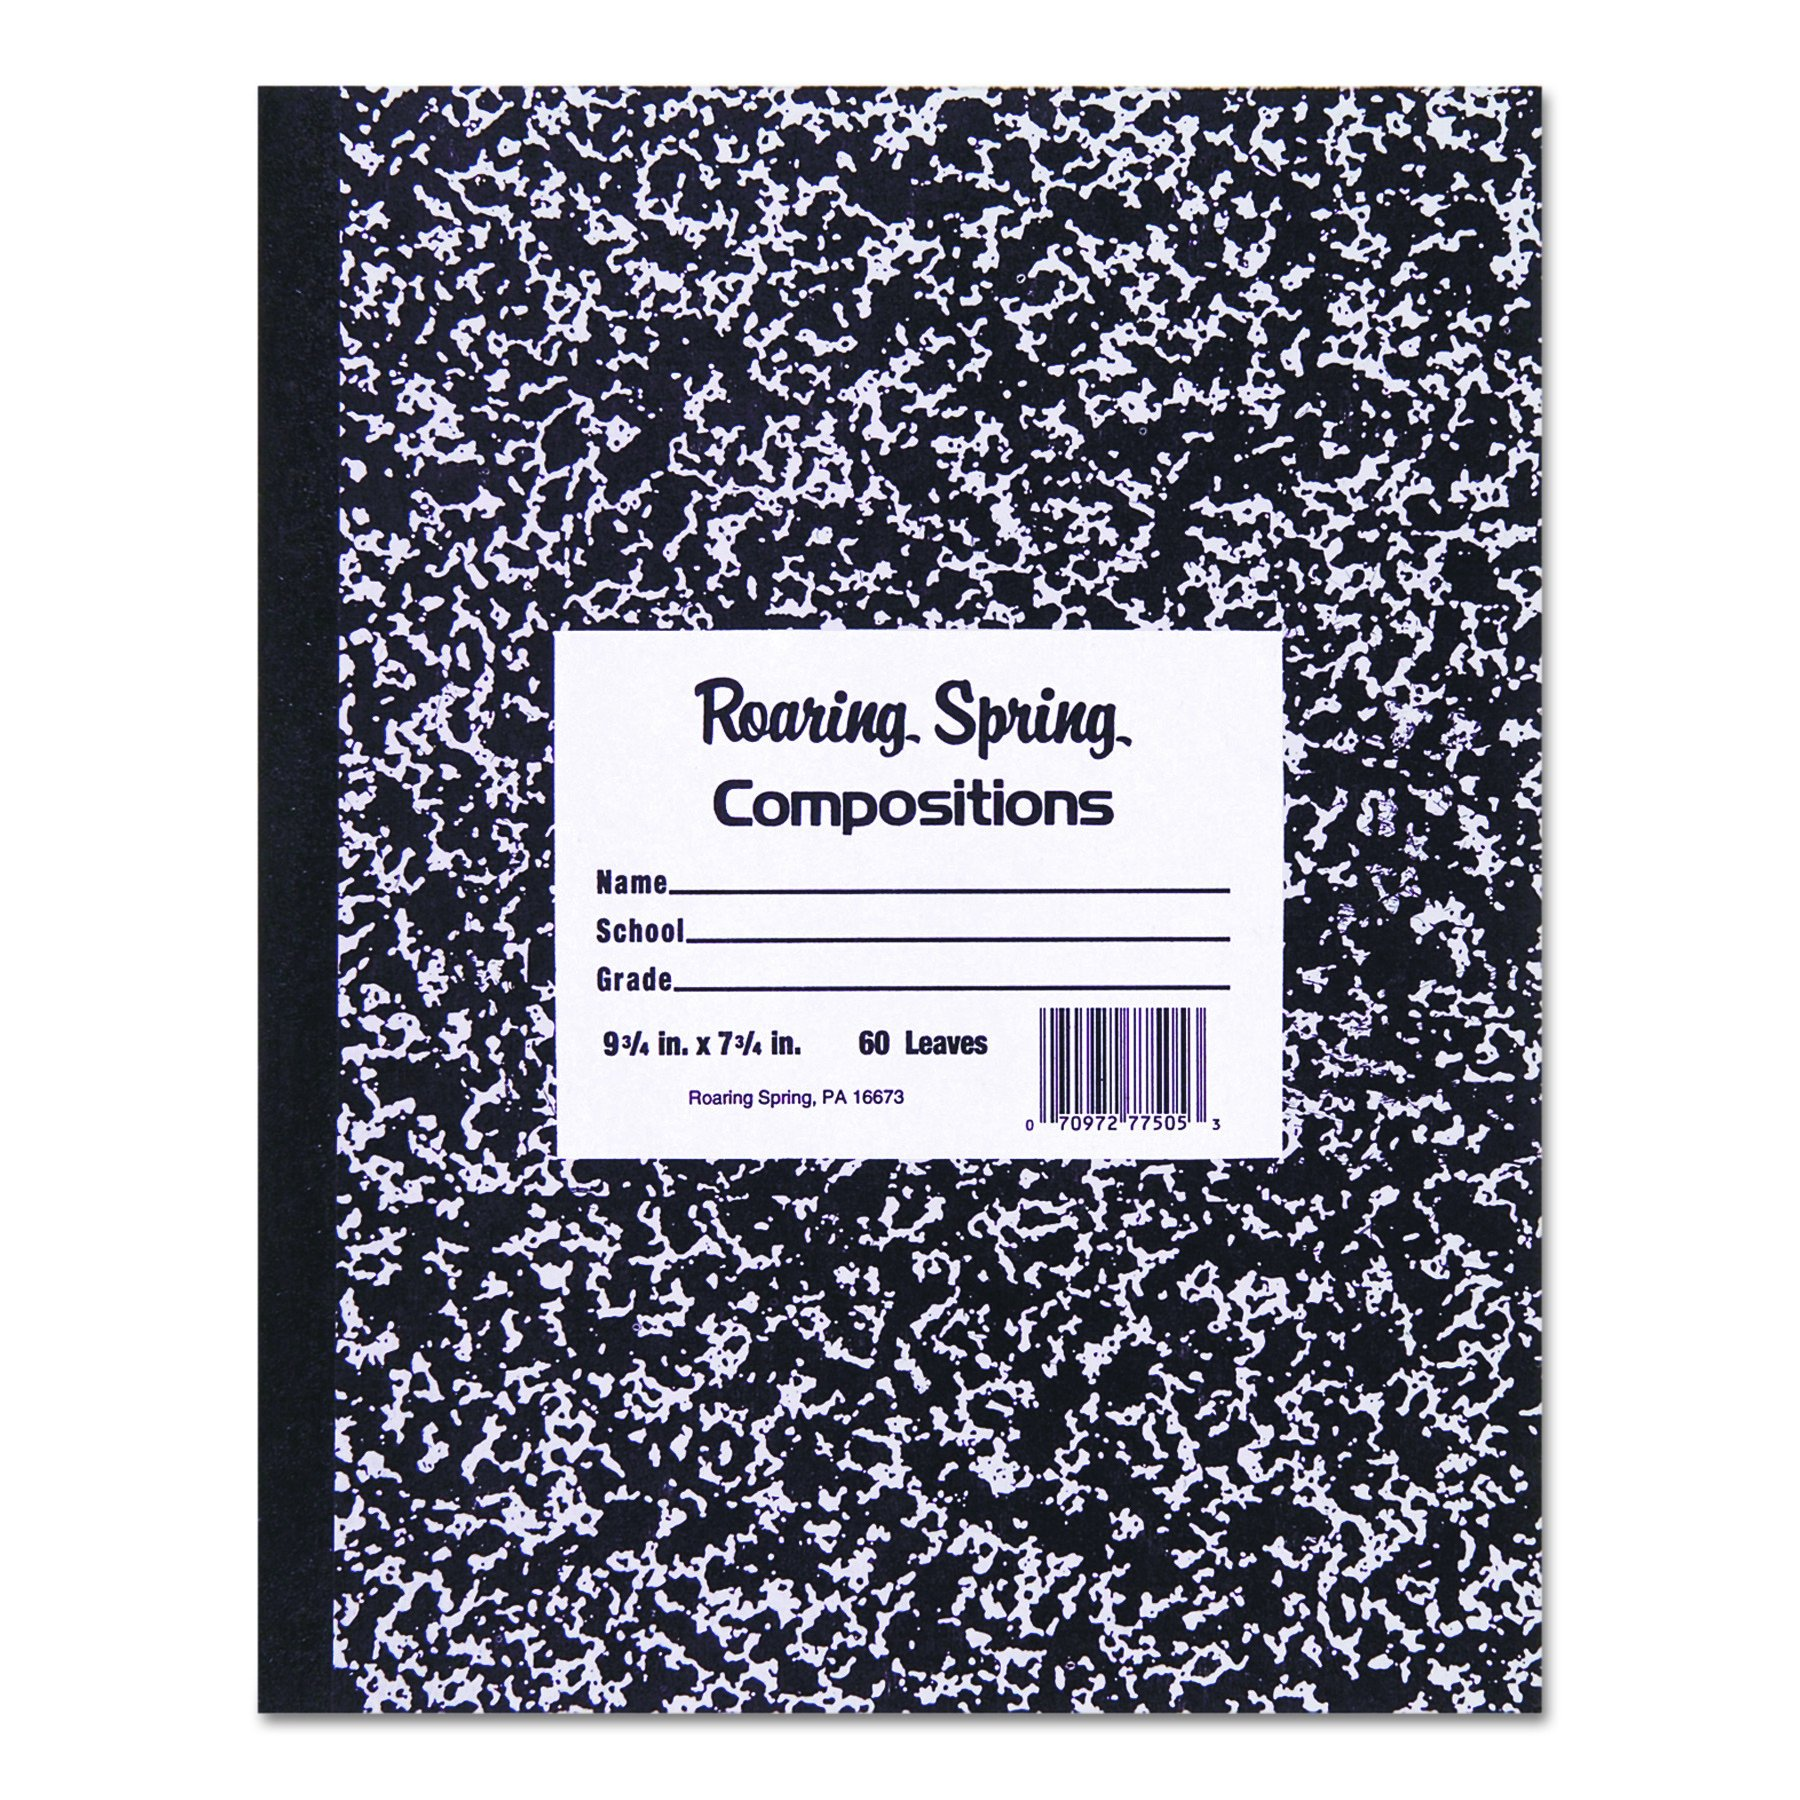 Roaring Spring Flexible Cover Composition Book, 8.5'' x 7'', 48 sheets